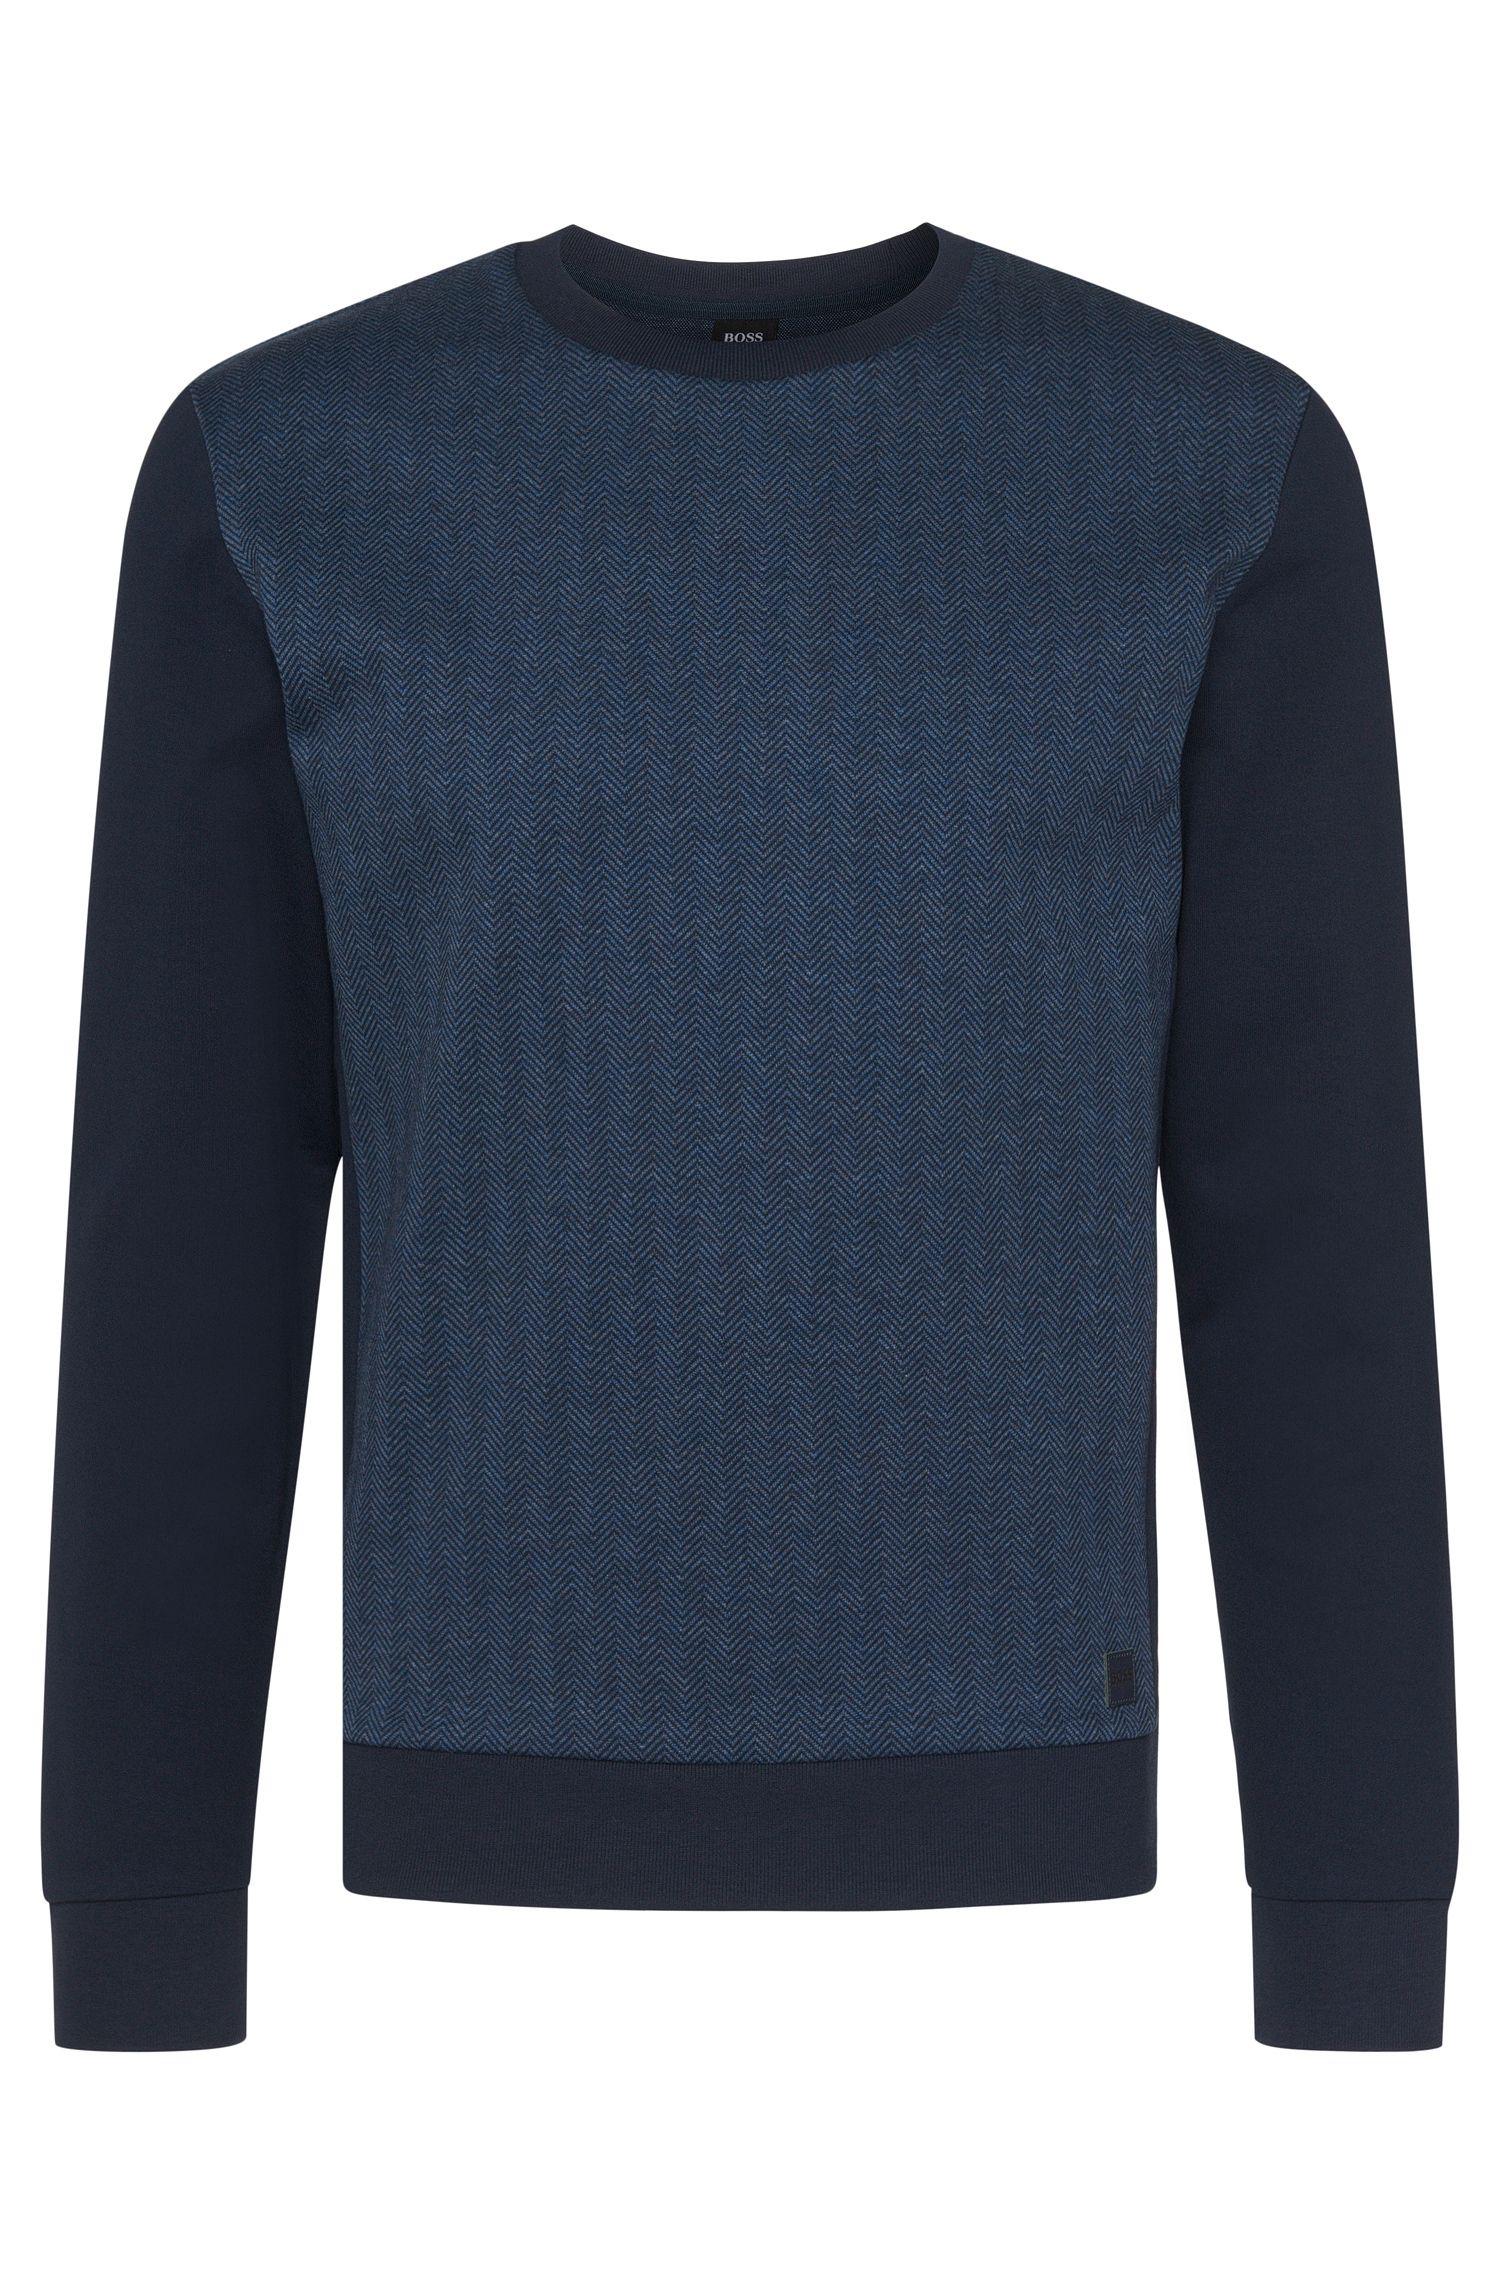 'Sweatshirt' | Cotton Herringbone Print Sweatshirt